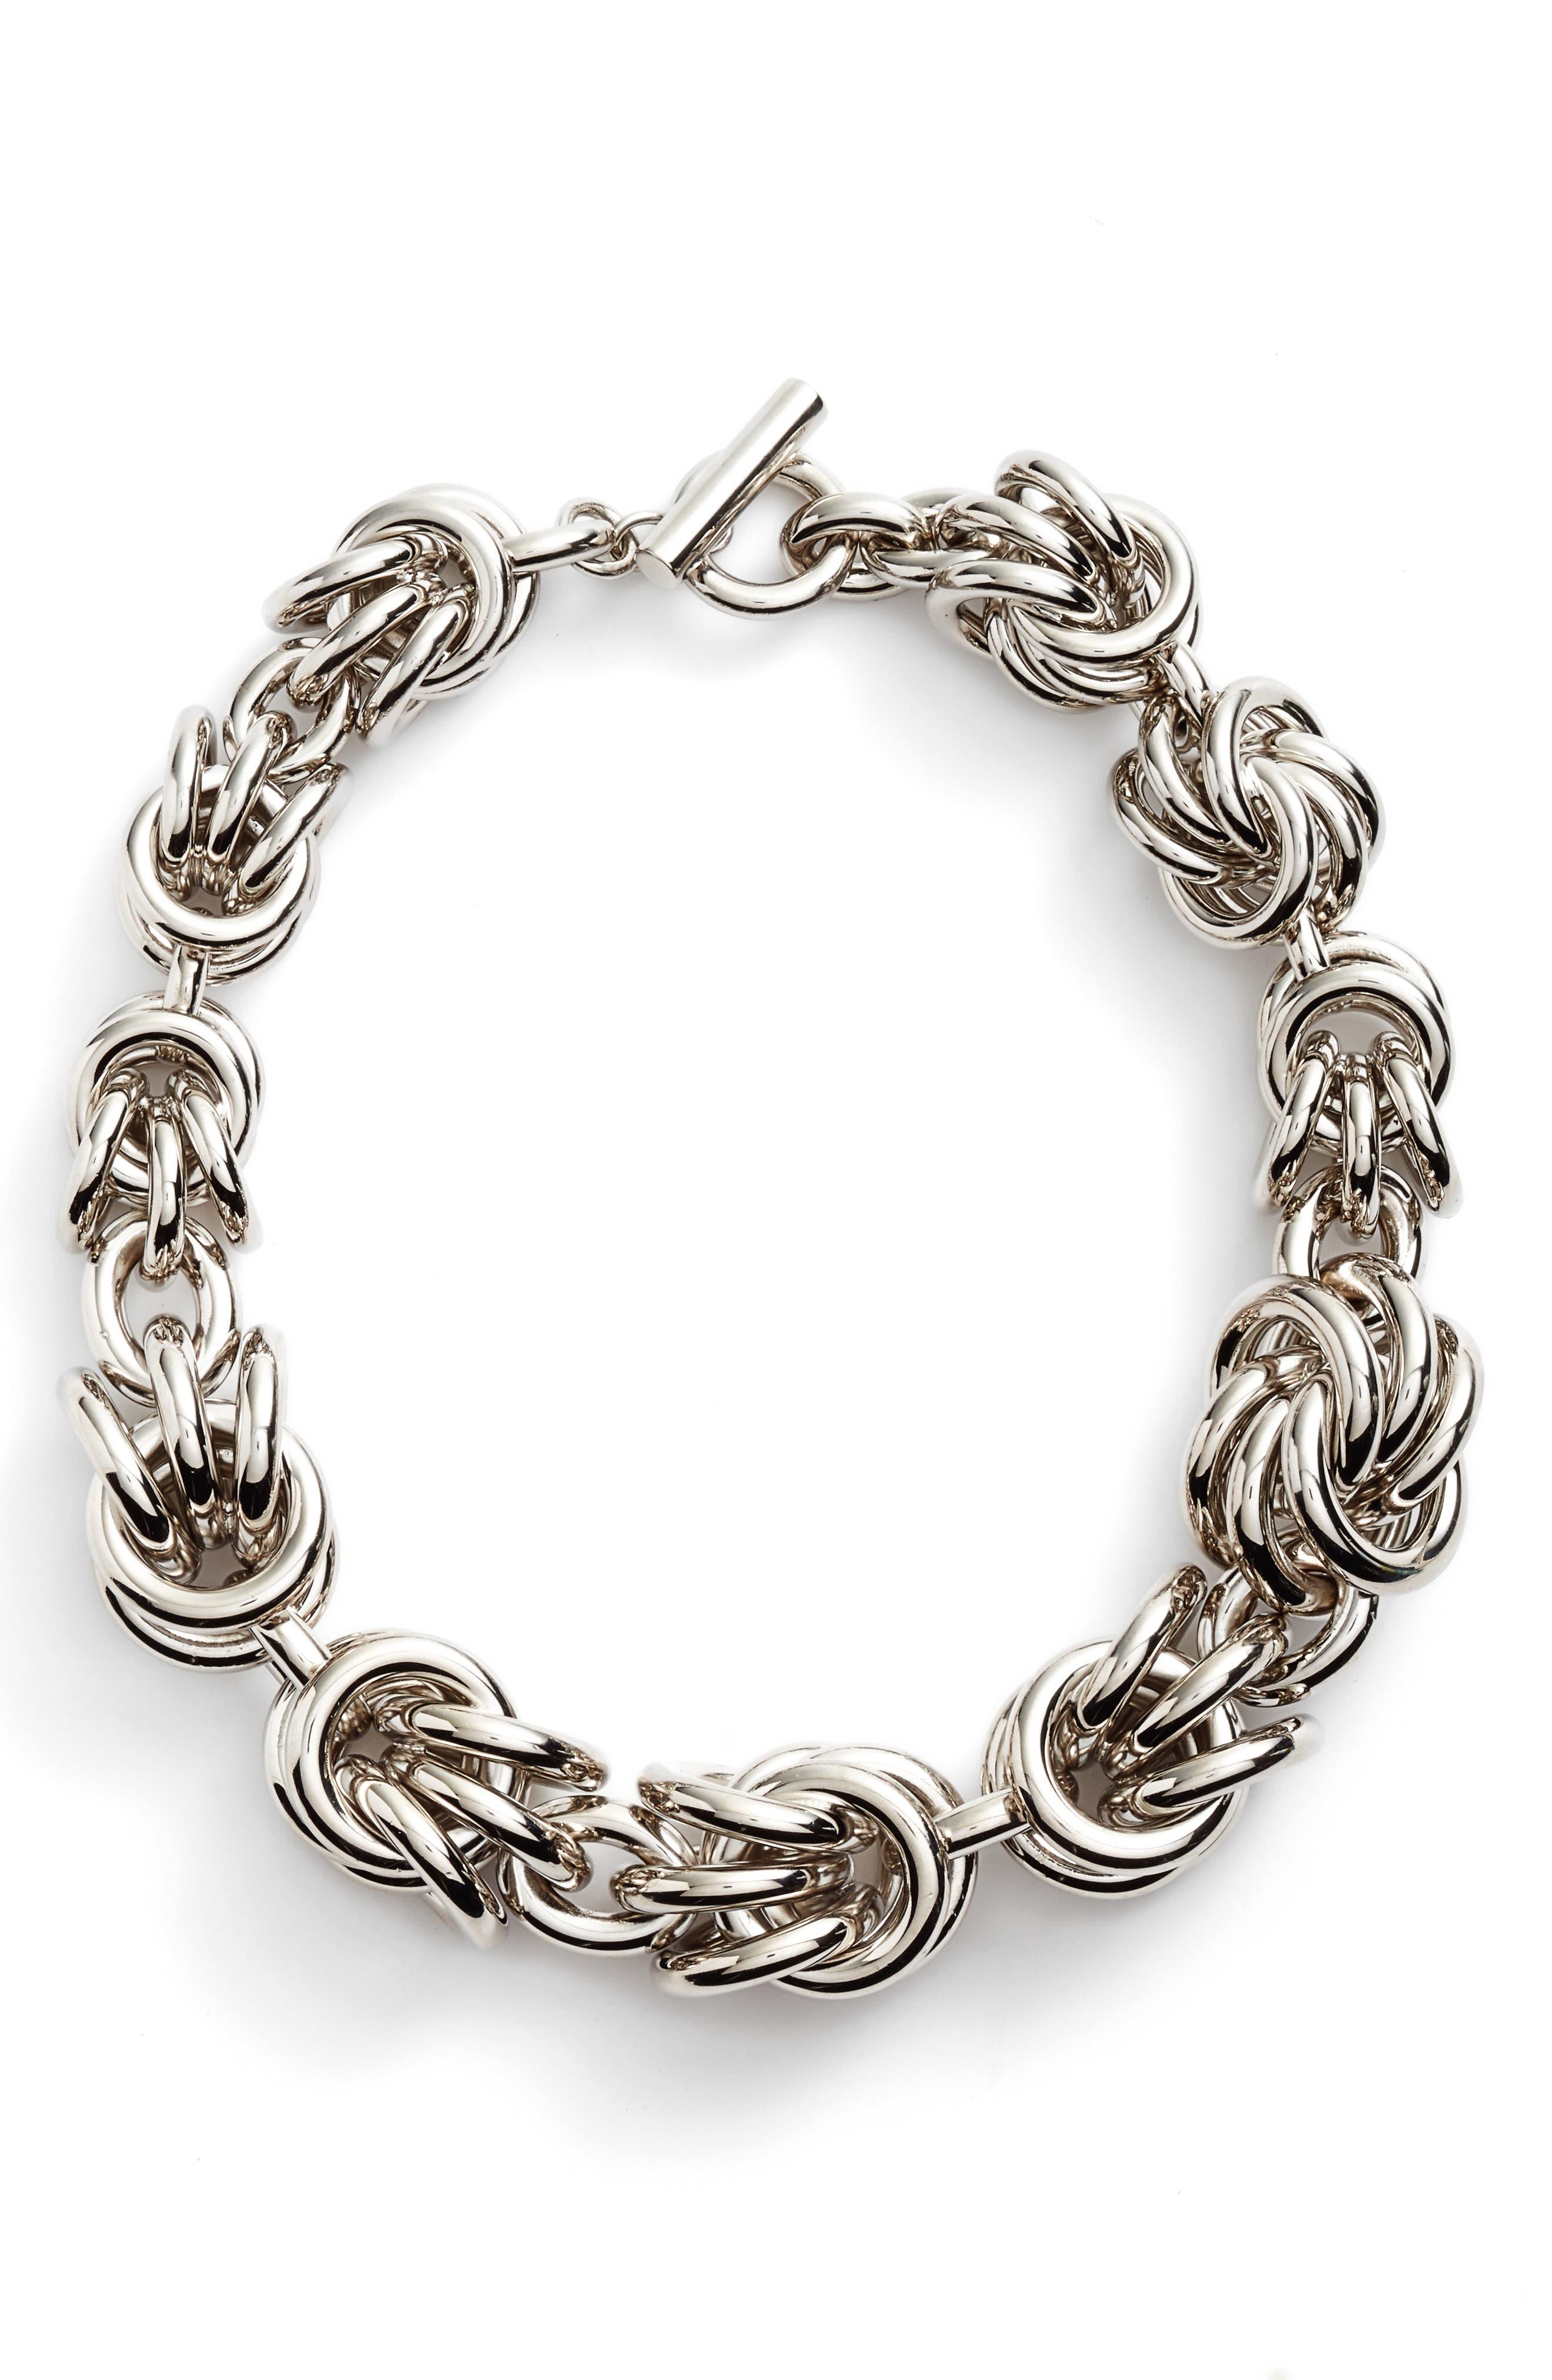 Knot Link Necklace,                             Main thumbnail 1, color,                             040